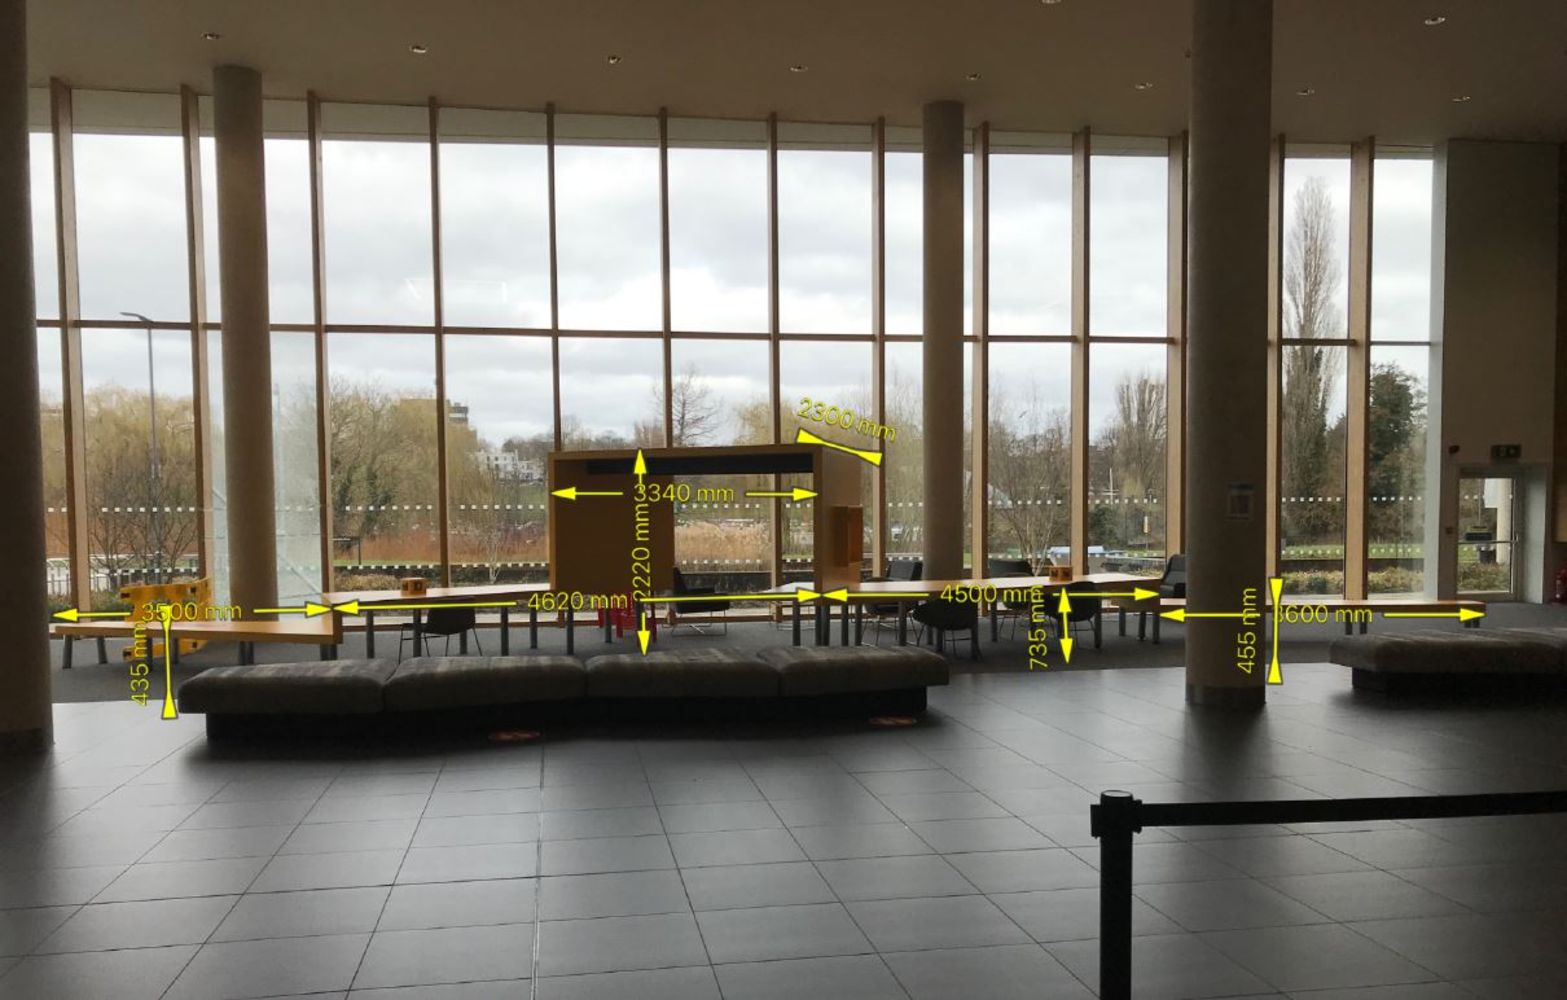 15m Long Multi-Functional Purpose Made Communal Study Desk  - NO RESERVE - LOCATION NORTHAMPTON